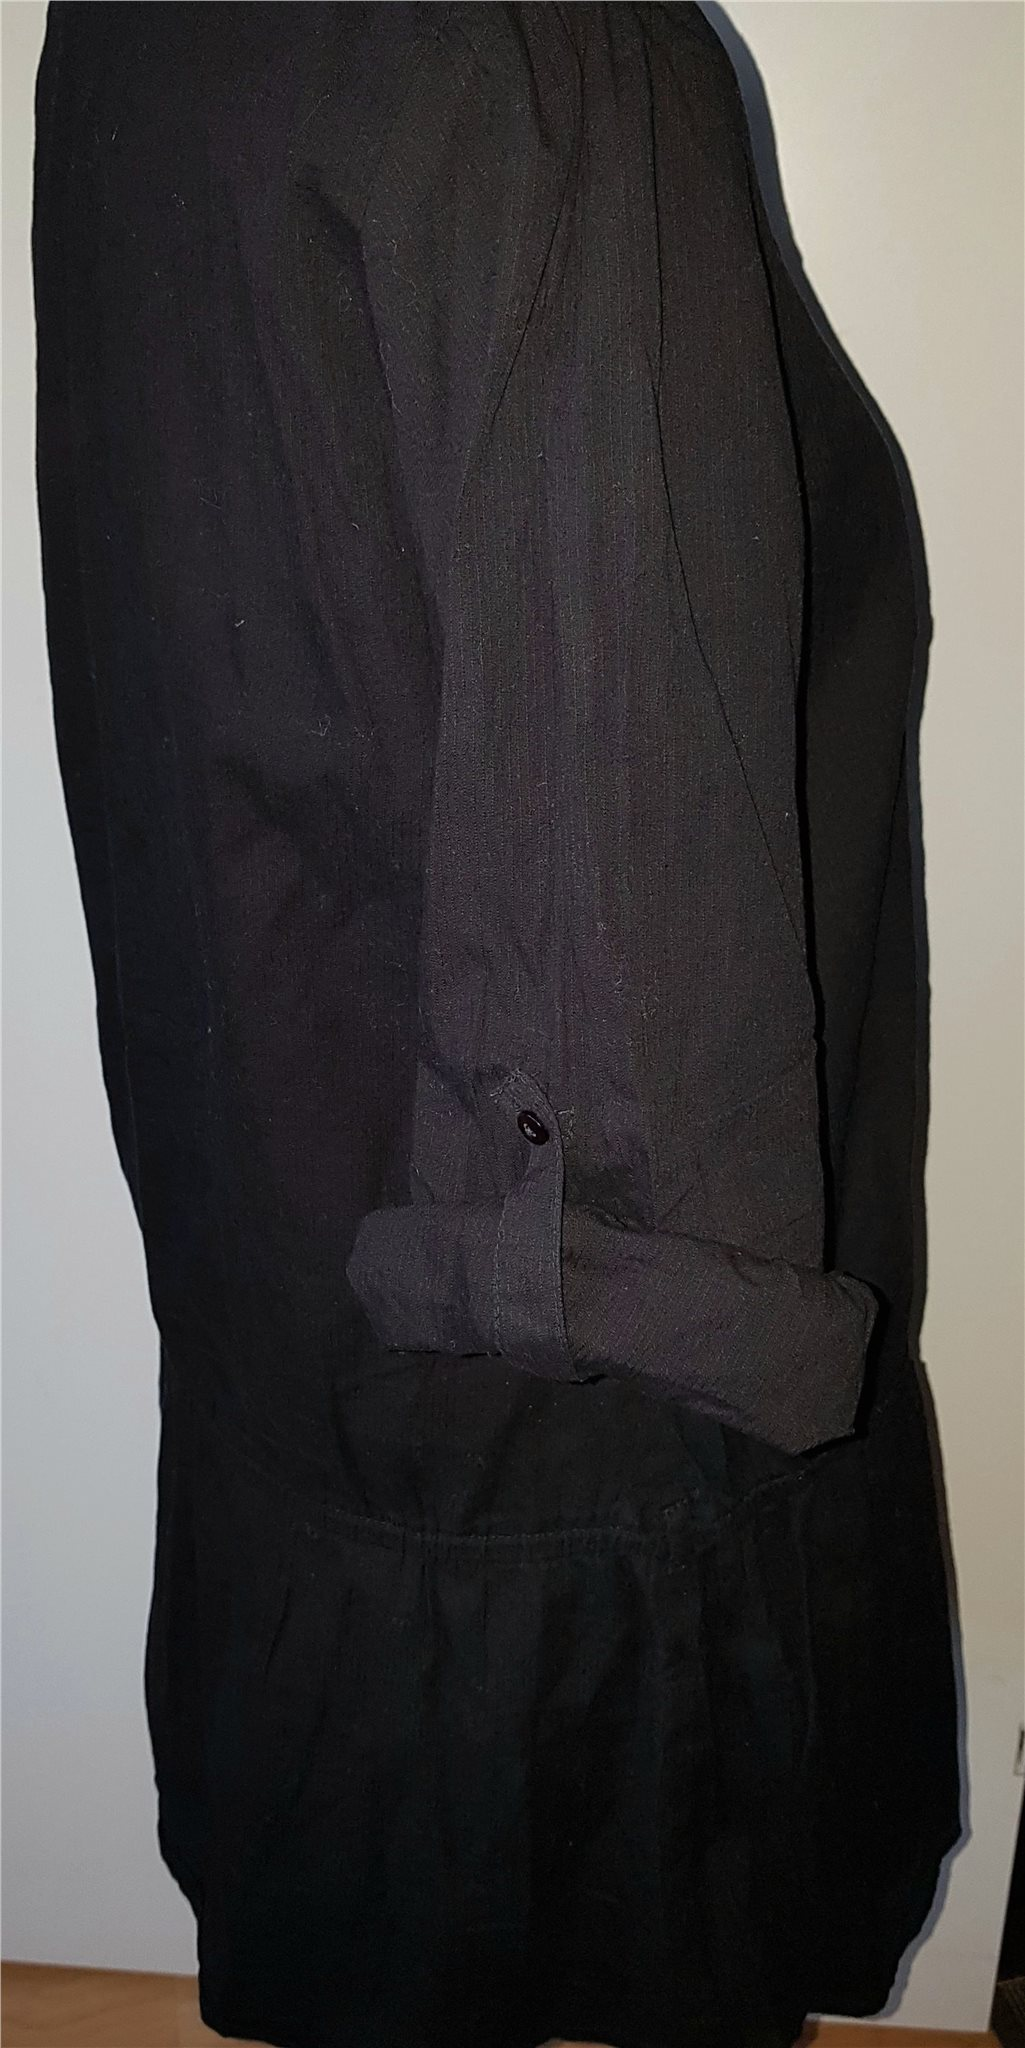 Stl 44 söt svart tunika tunika tunika med guldiga nitar fina detaljer a31d9a